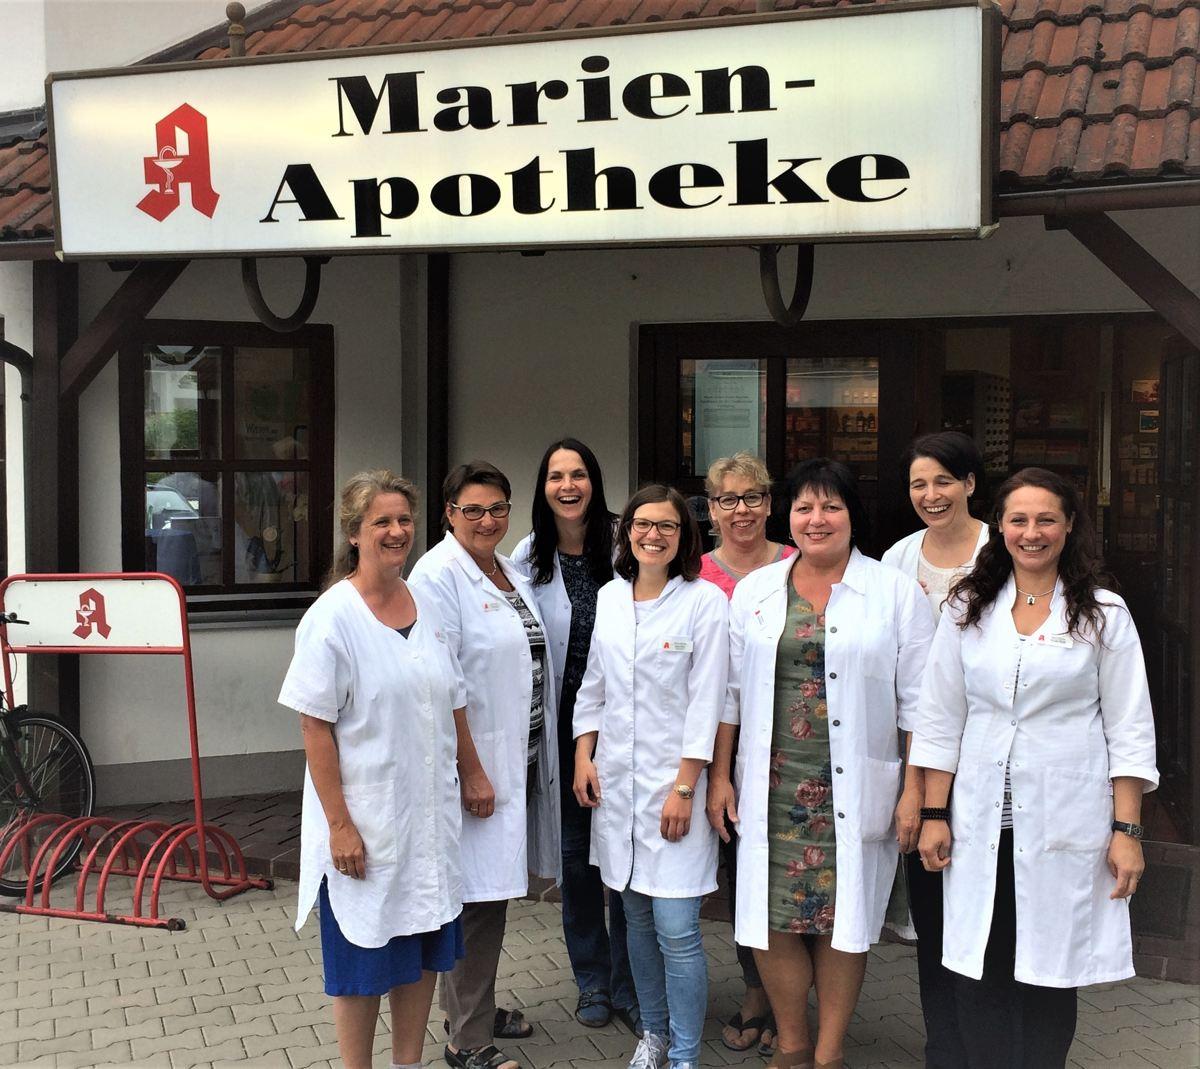 Moderne Berufsbilder In Der Apotheke Marien Apotheke Dasing Dasing